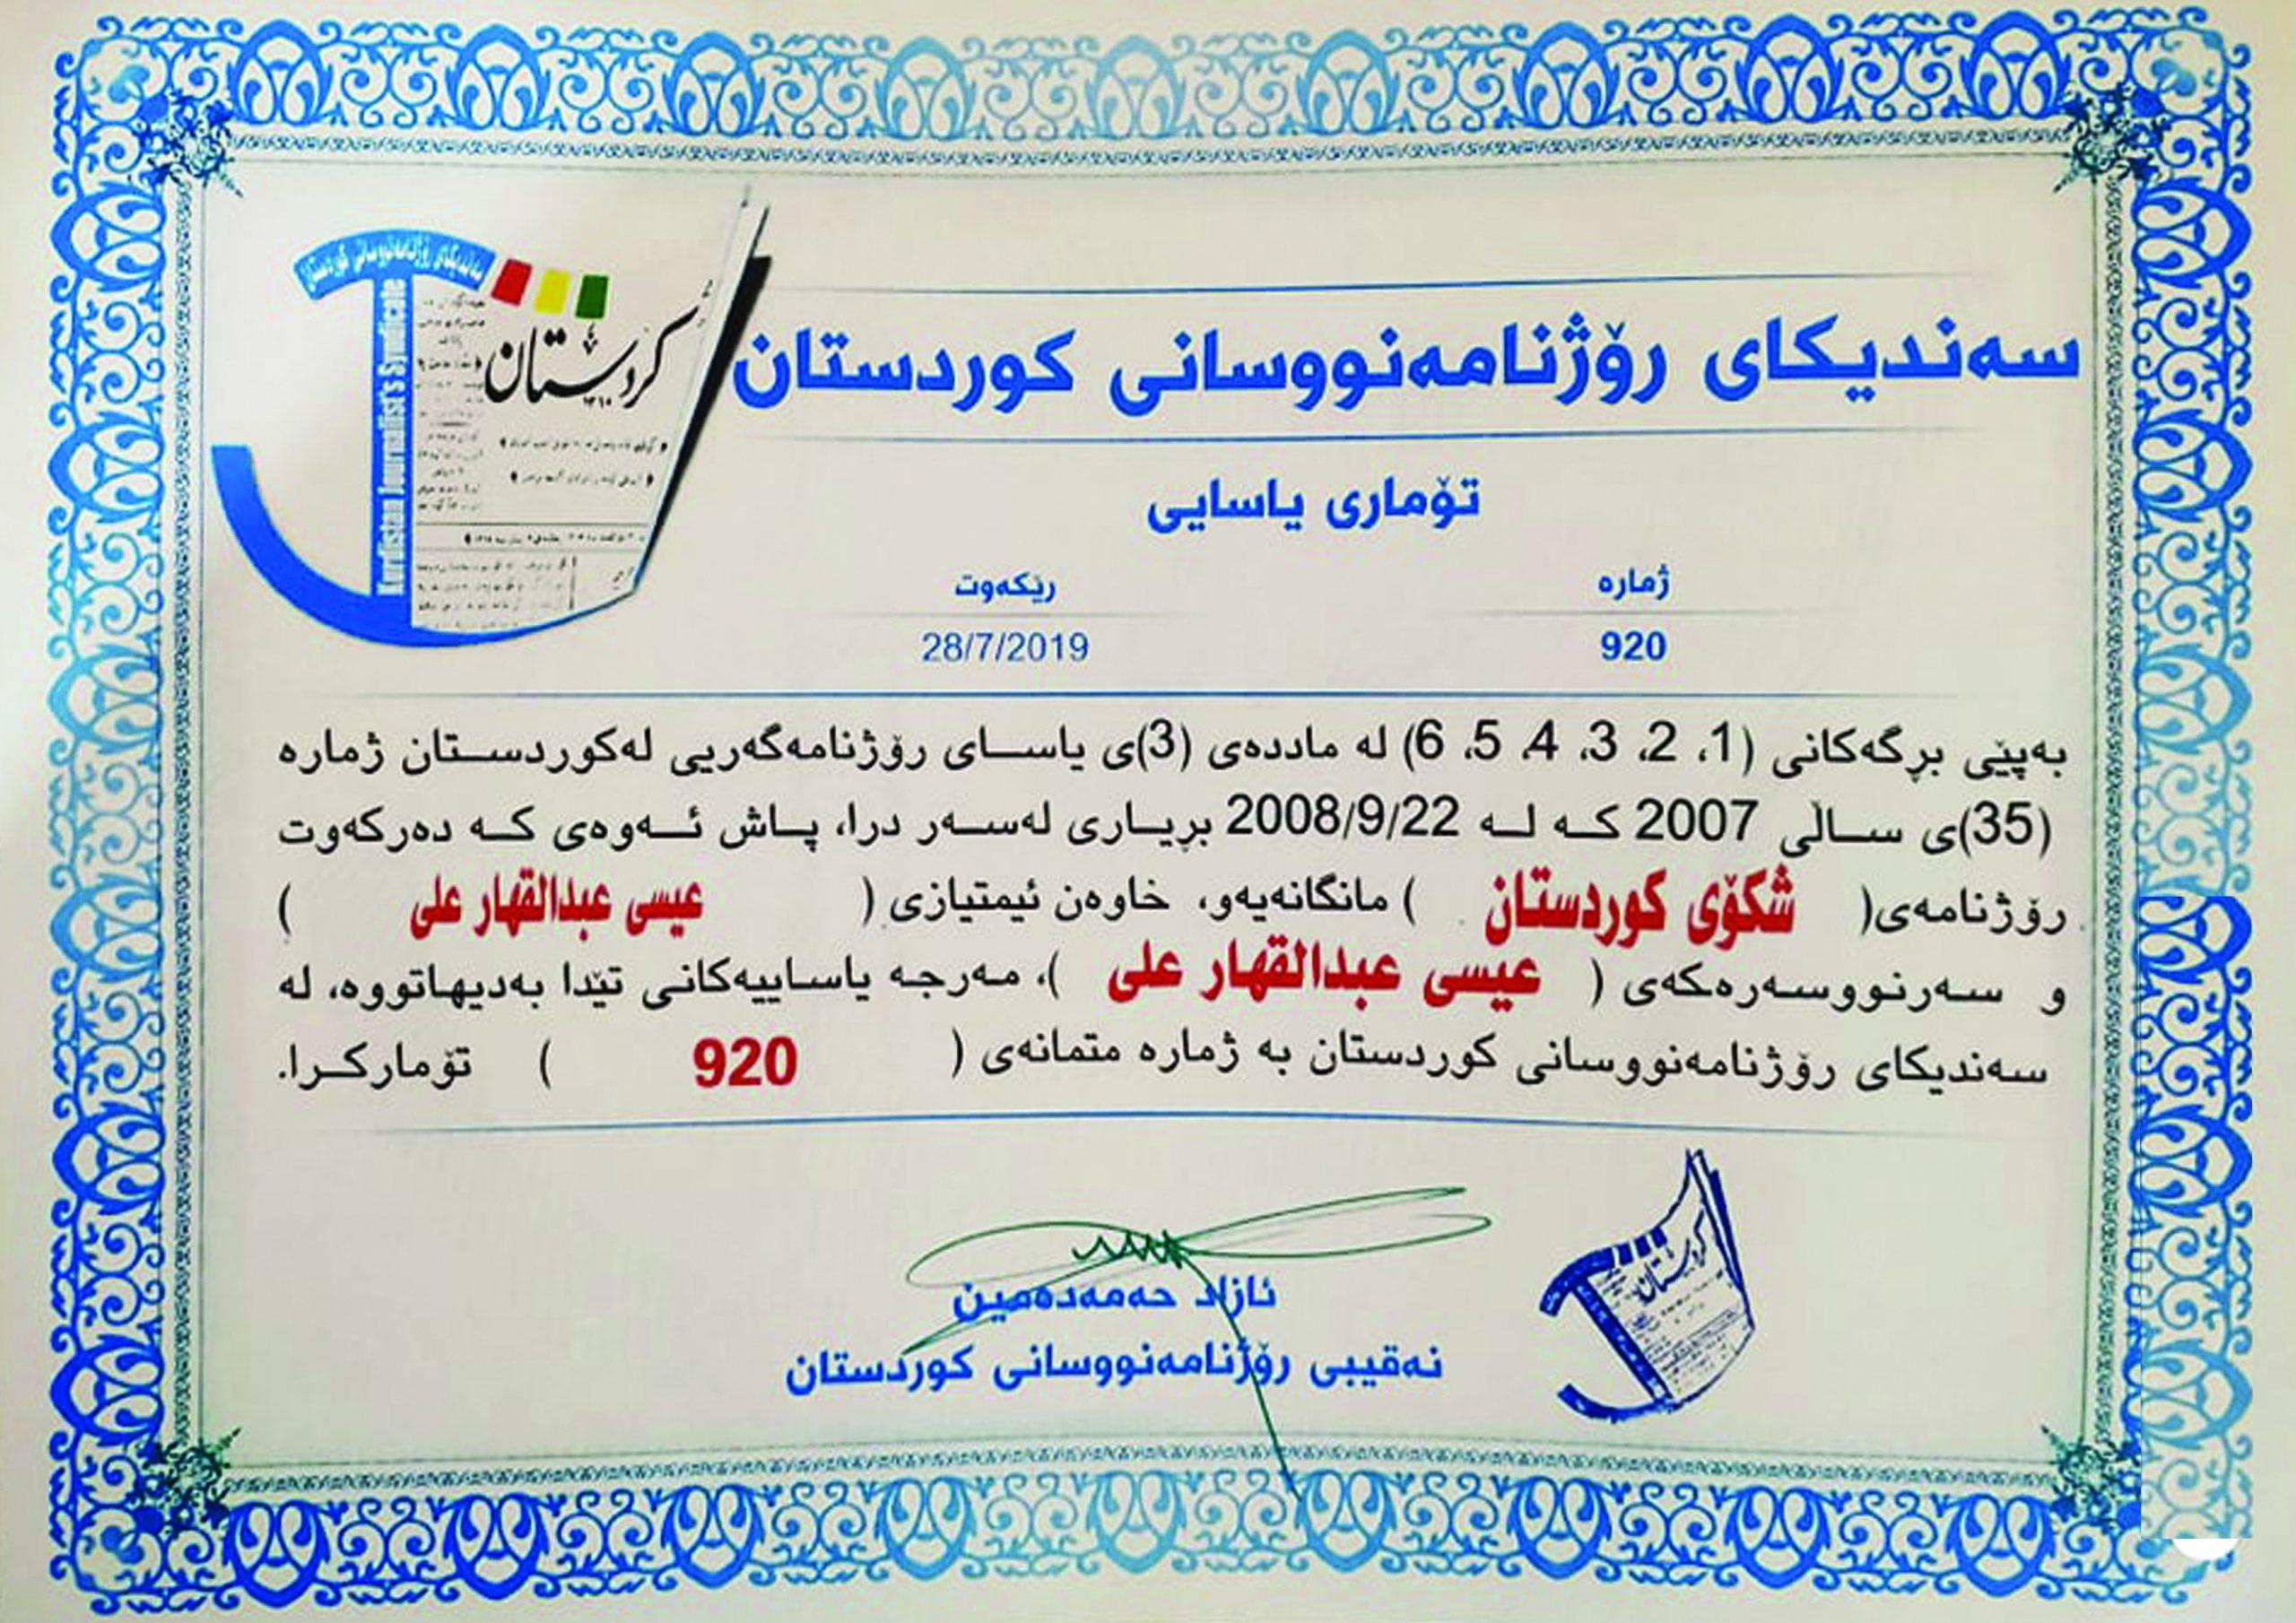 Photo of یەکەم ژمارەی شکۆی کوردستان بڵاوکرایەوە